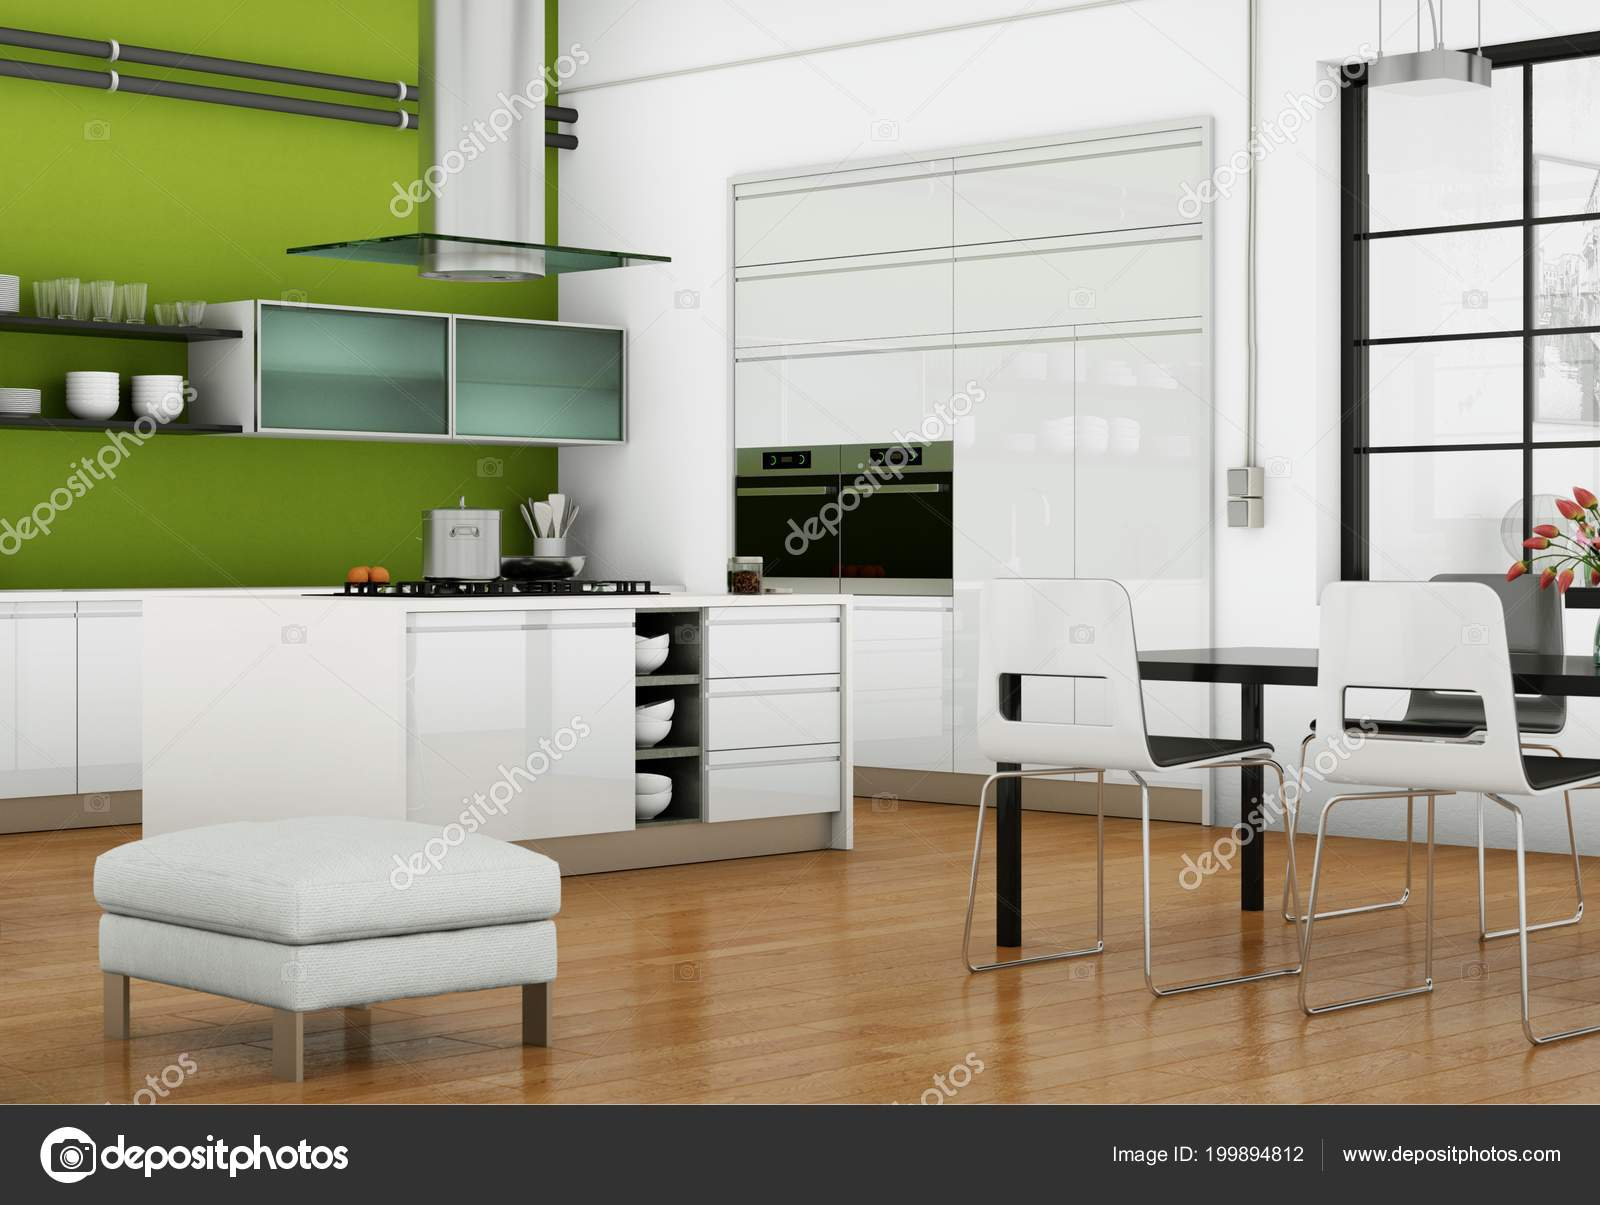 Cucina moderna bianca in un loft con una parete verde — Foto Stock ...